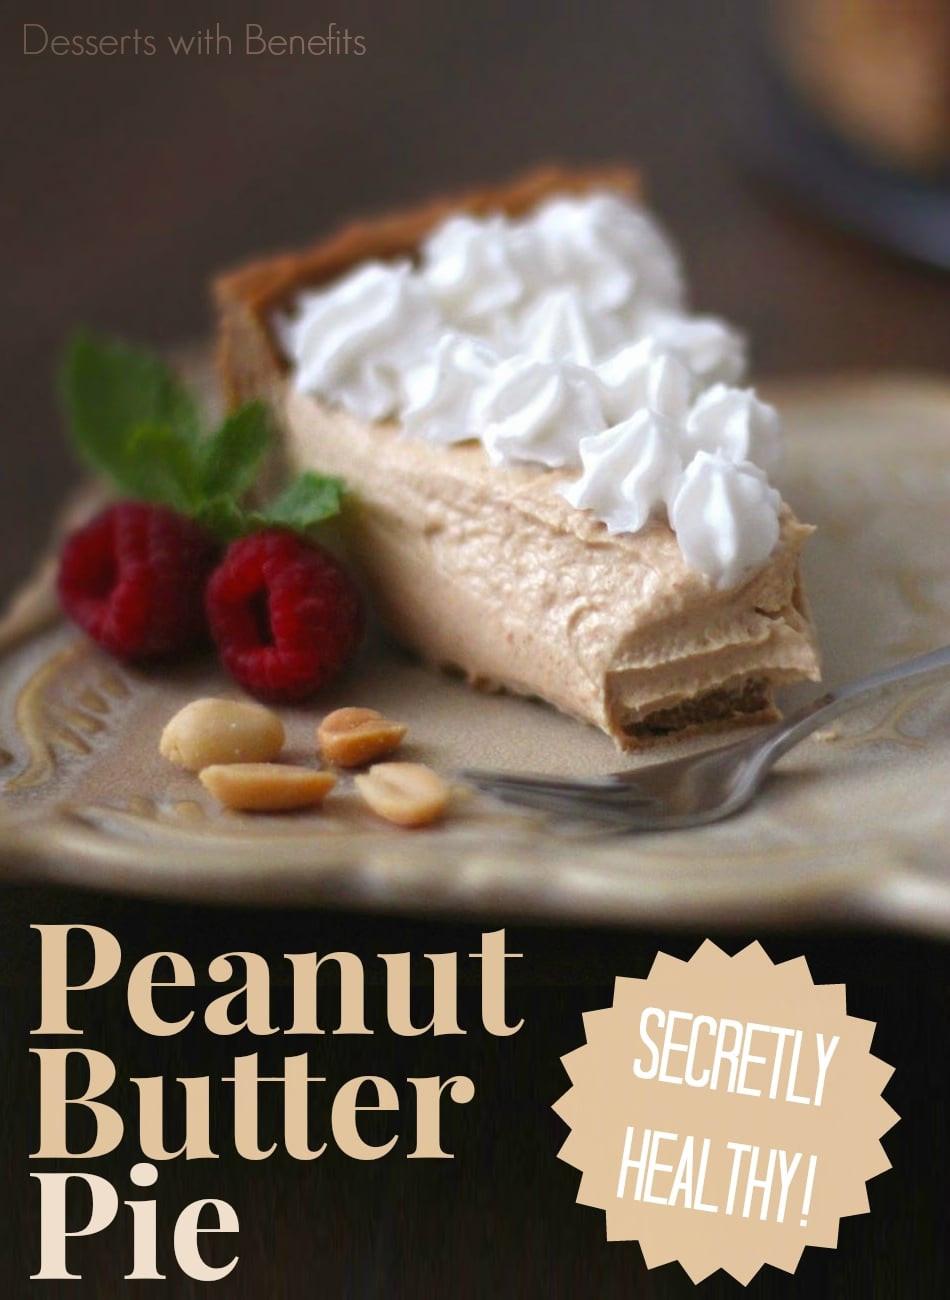 Healthy Peanut Butter Dessert Recipes  Desserts With Benefits Healthy Peanut Butter Pie